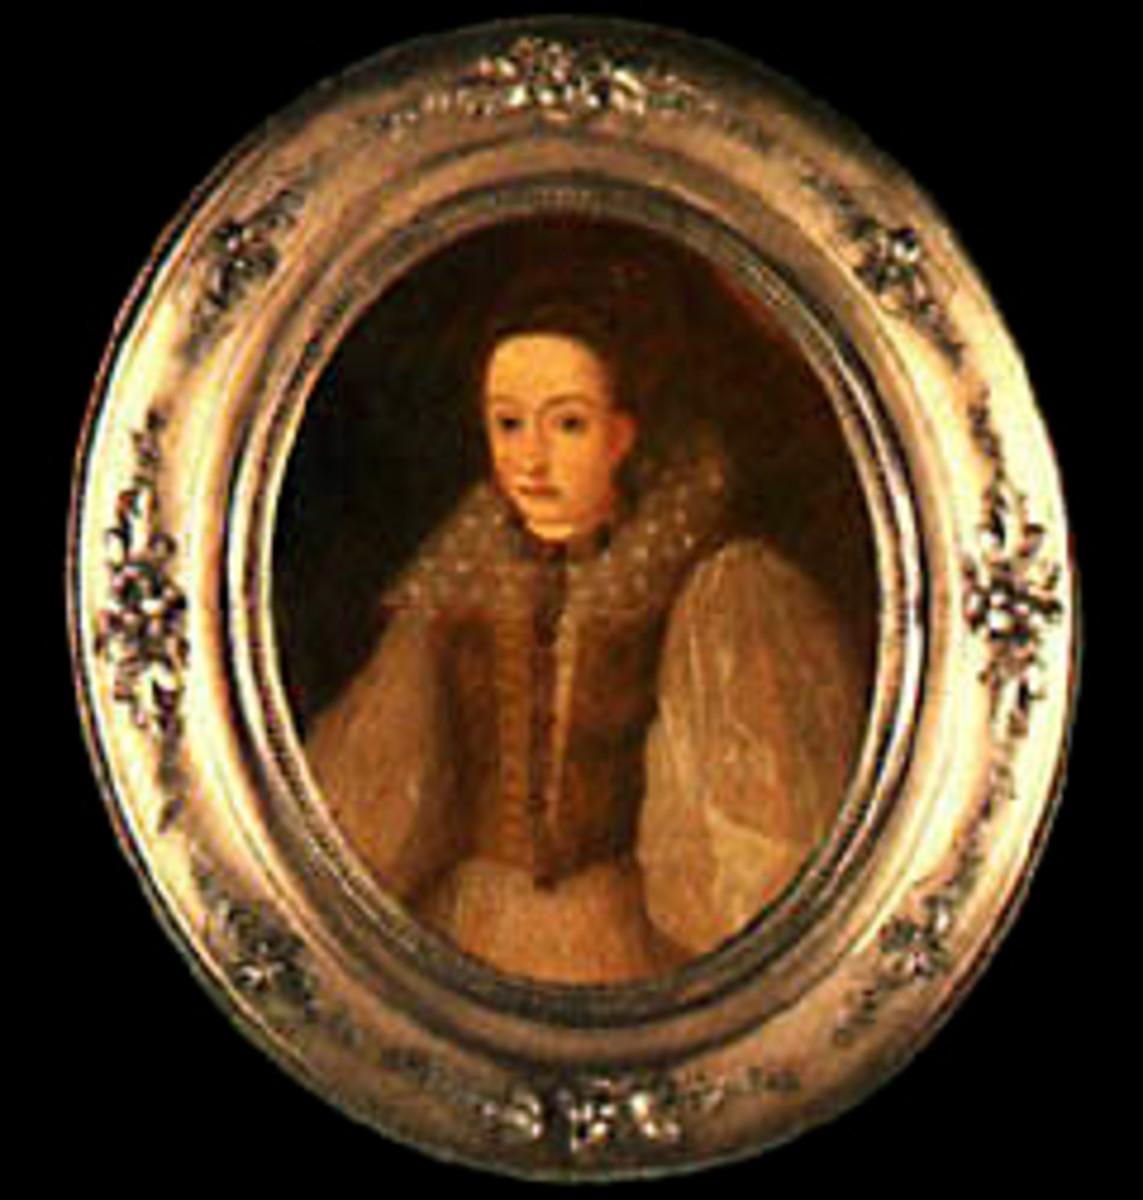 Elizabeth Bathory, The Bloody Countess